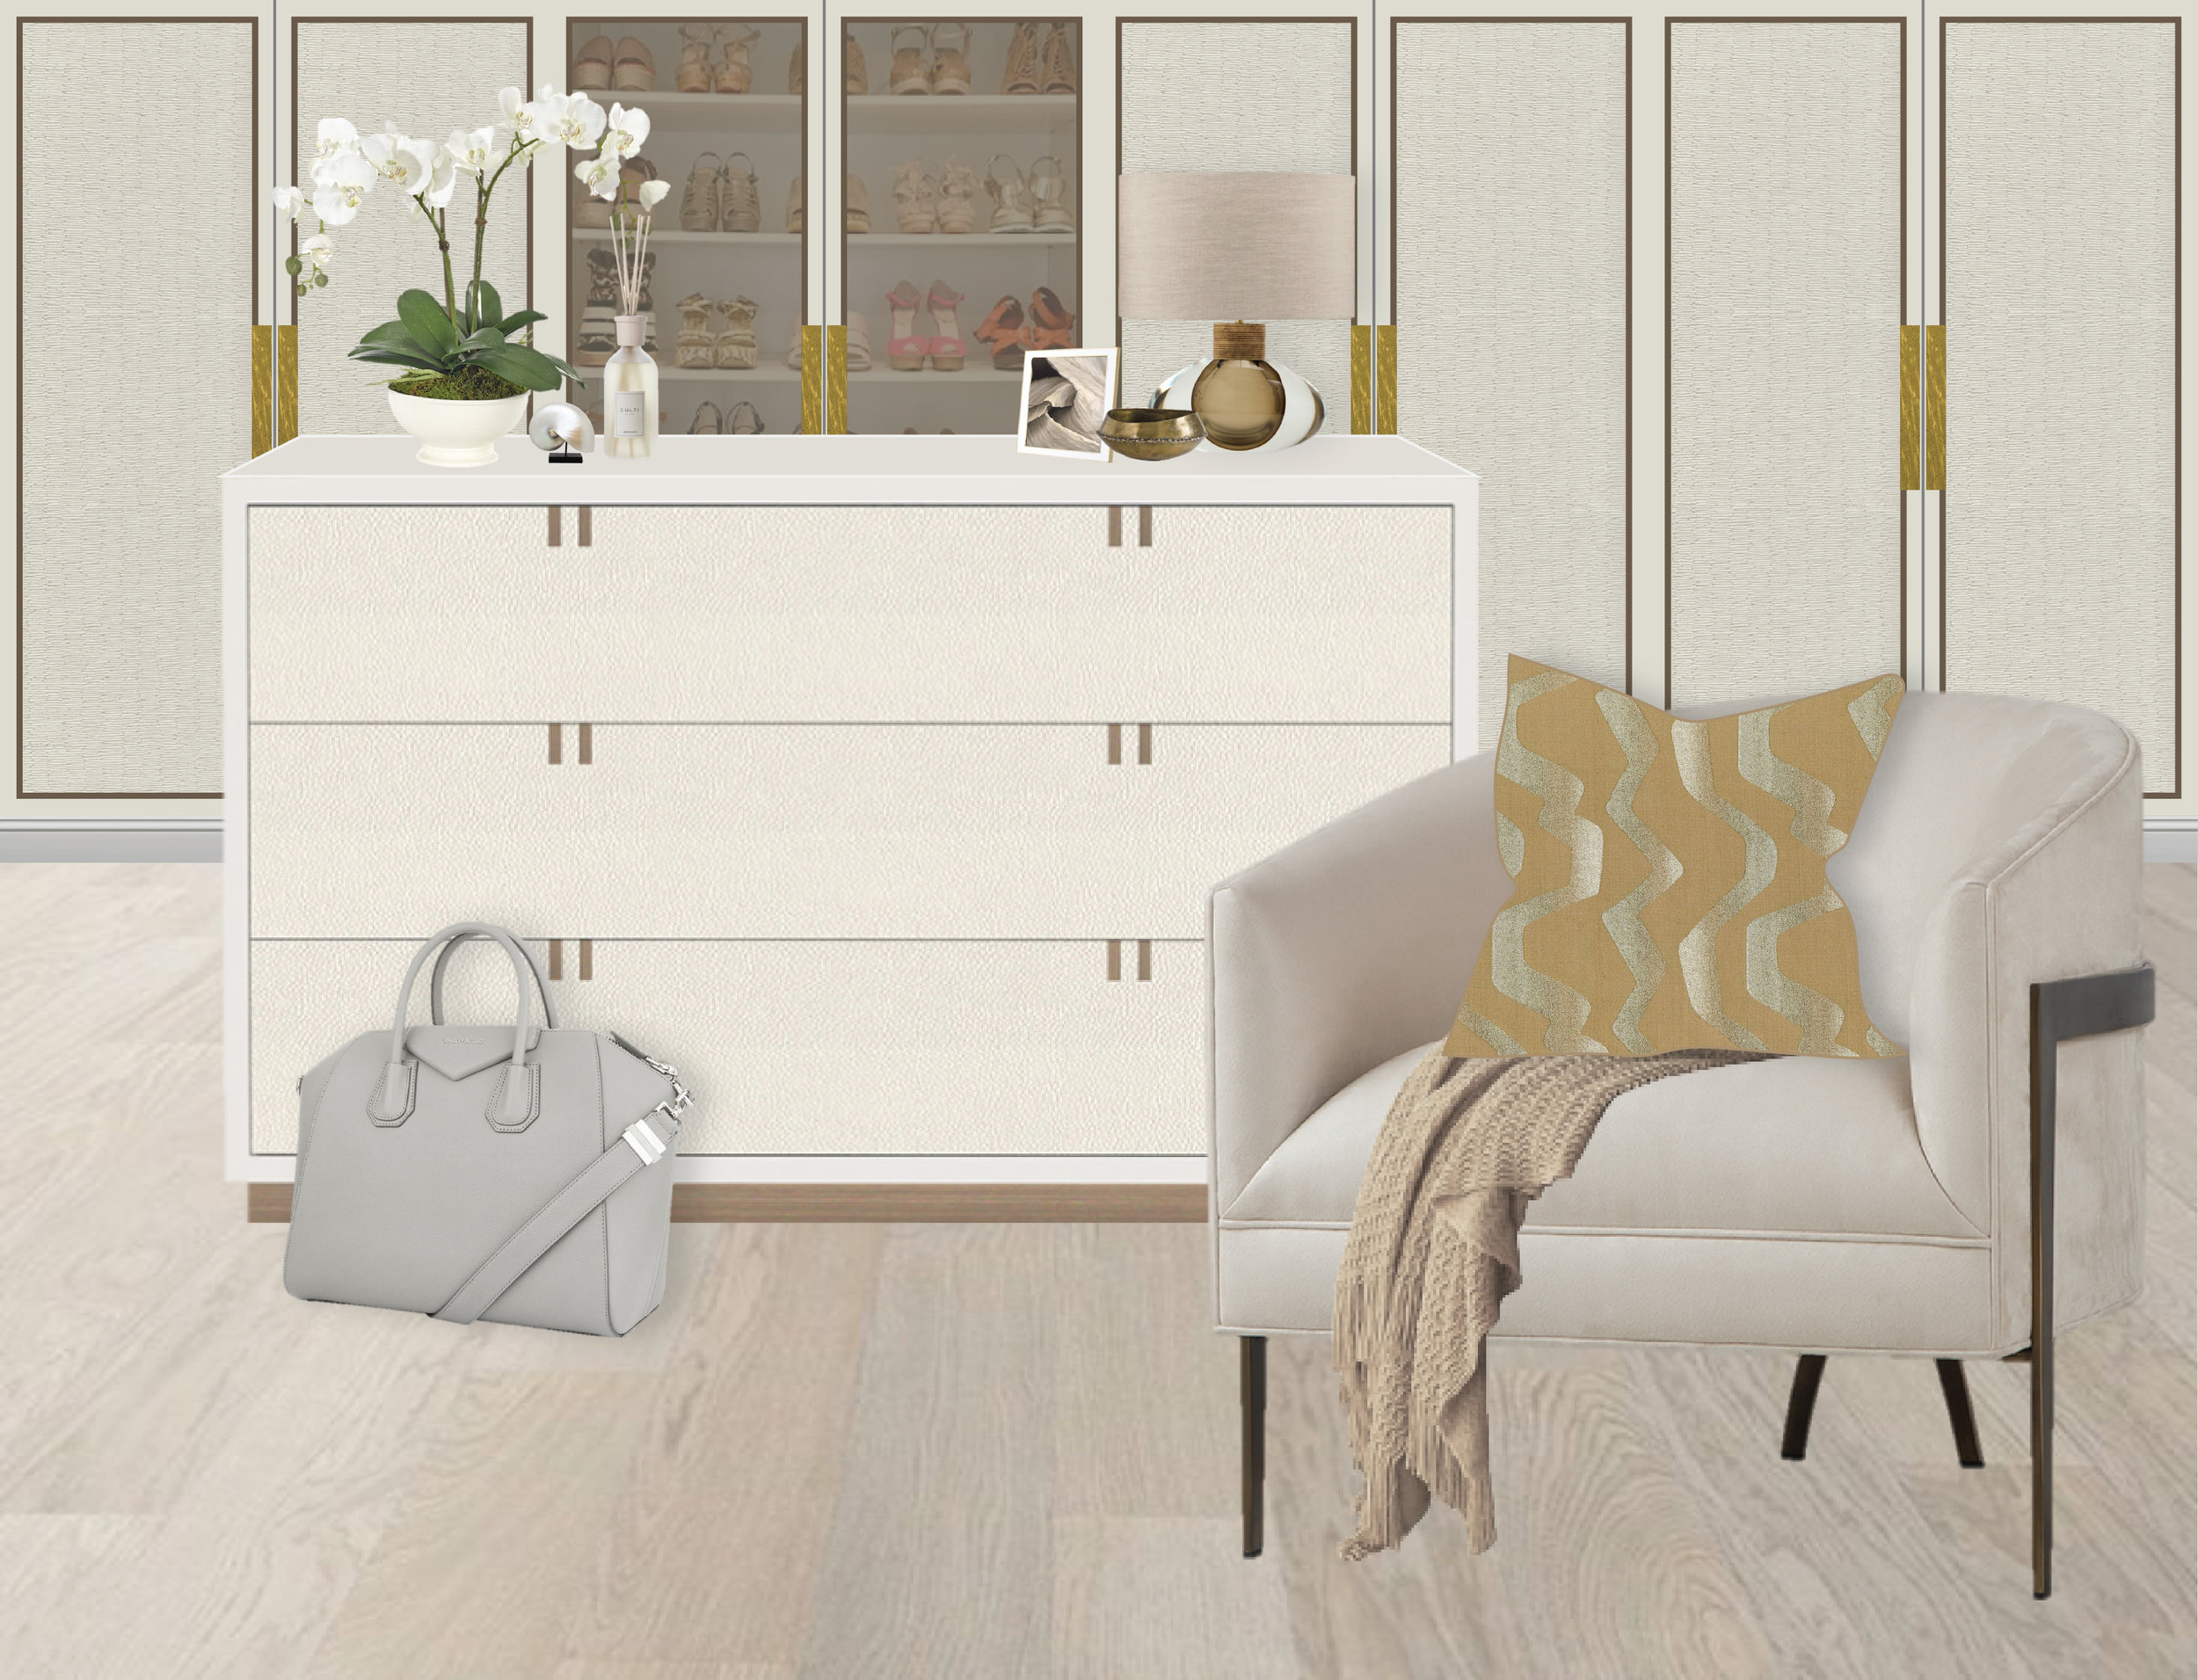 Women's+Dressing+Room+by+Synonymous+|+Luxury+Interior+Design+NYC+|+Synonymouss.com.jpg